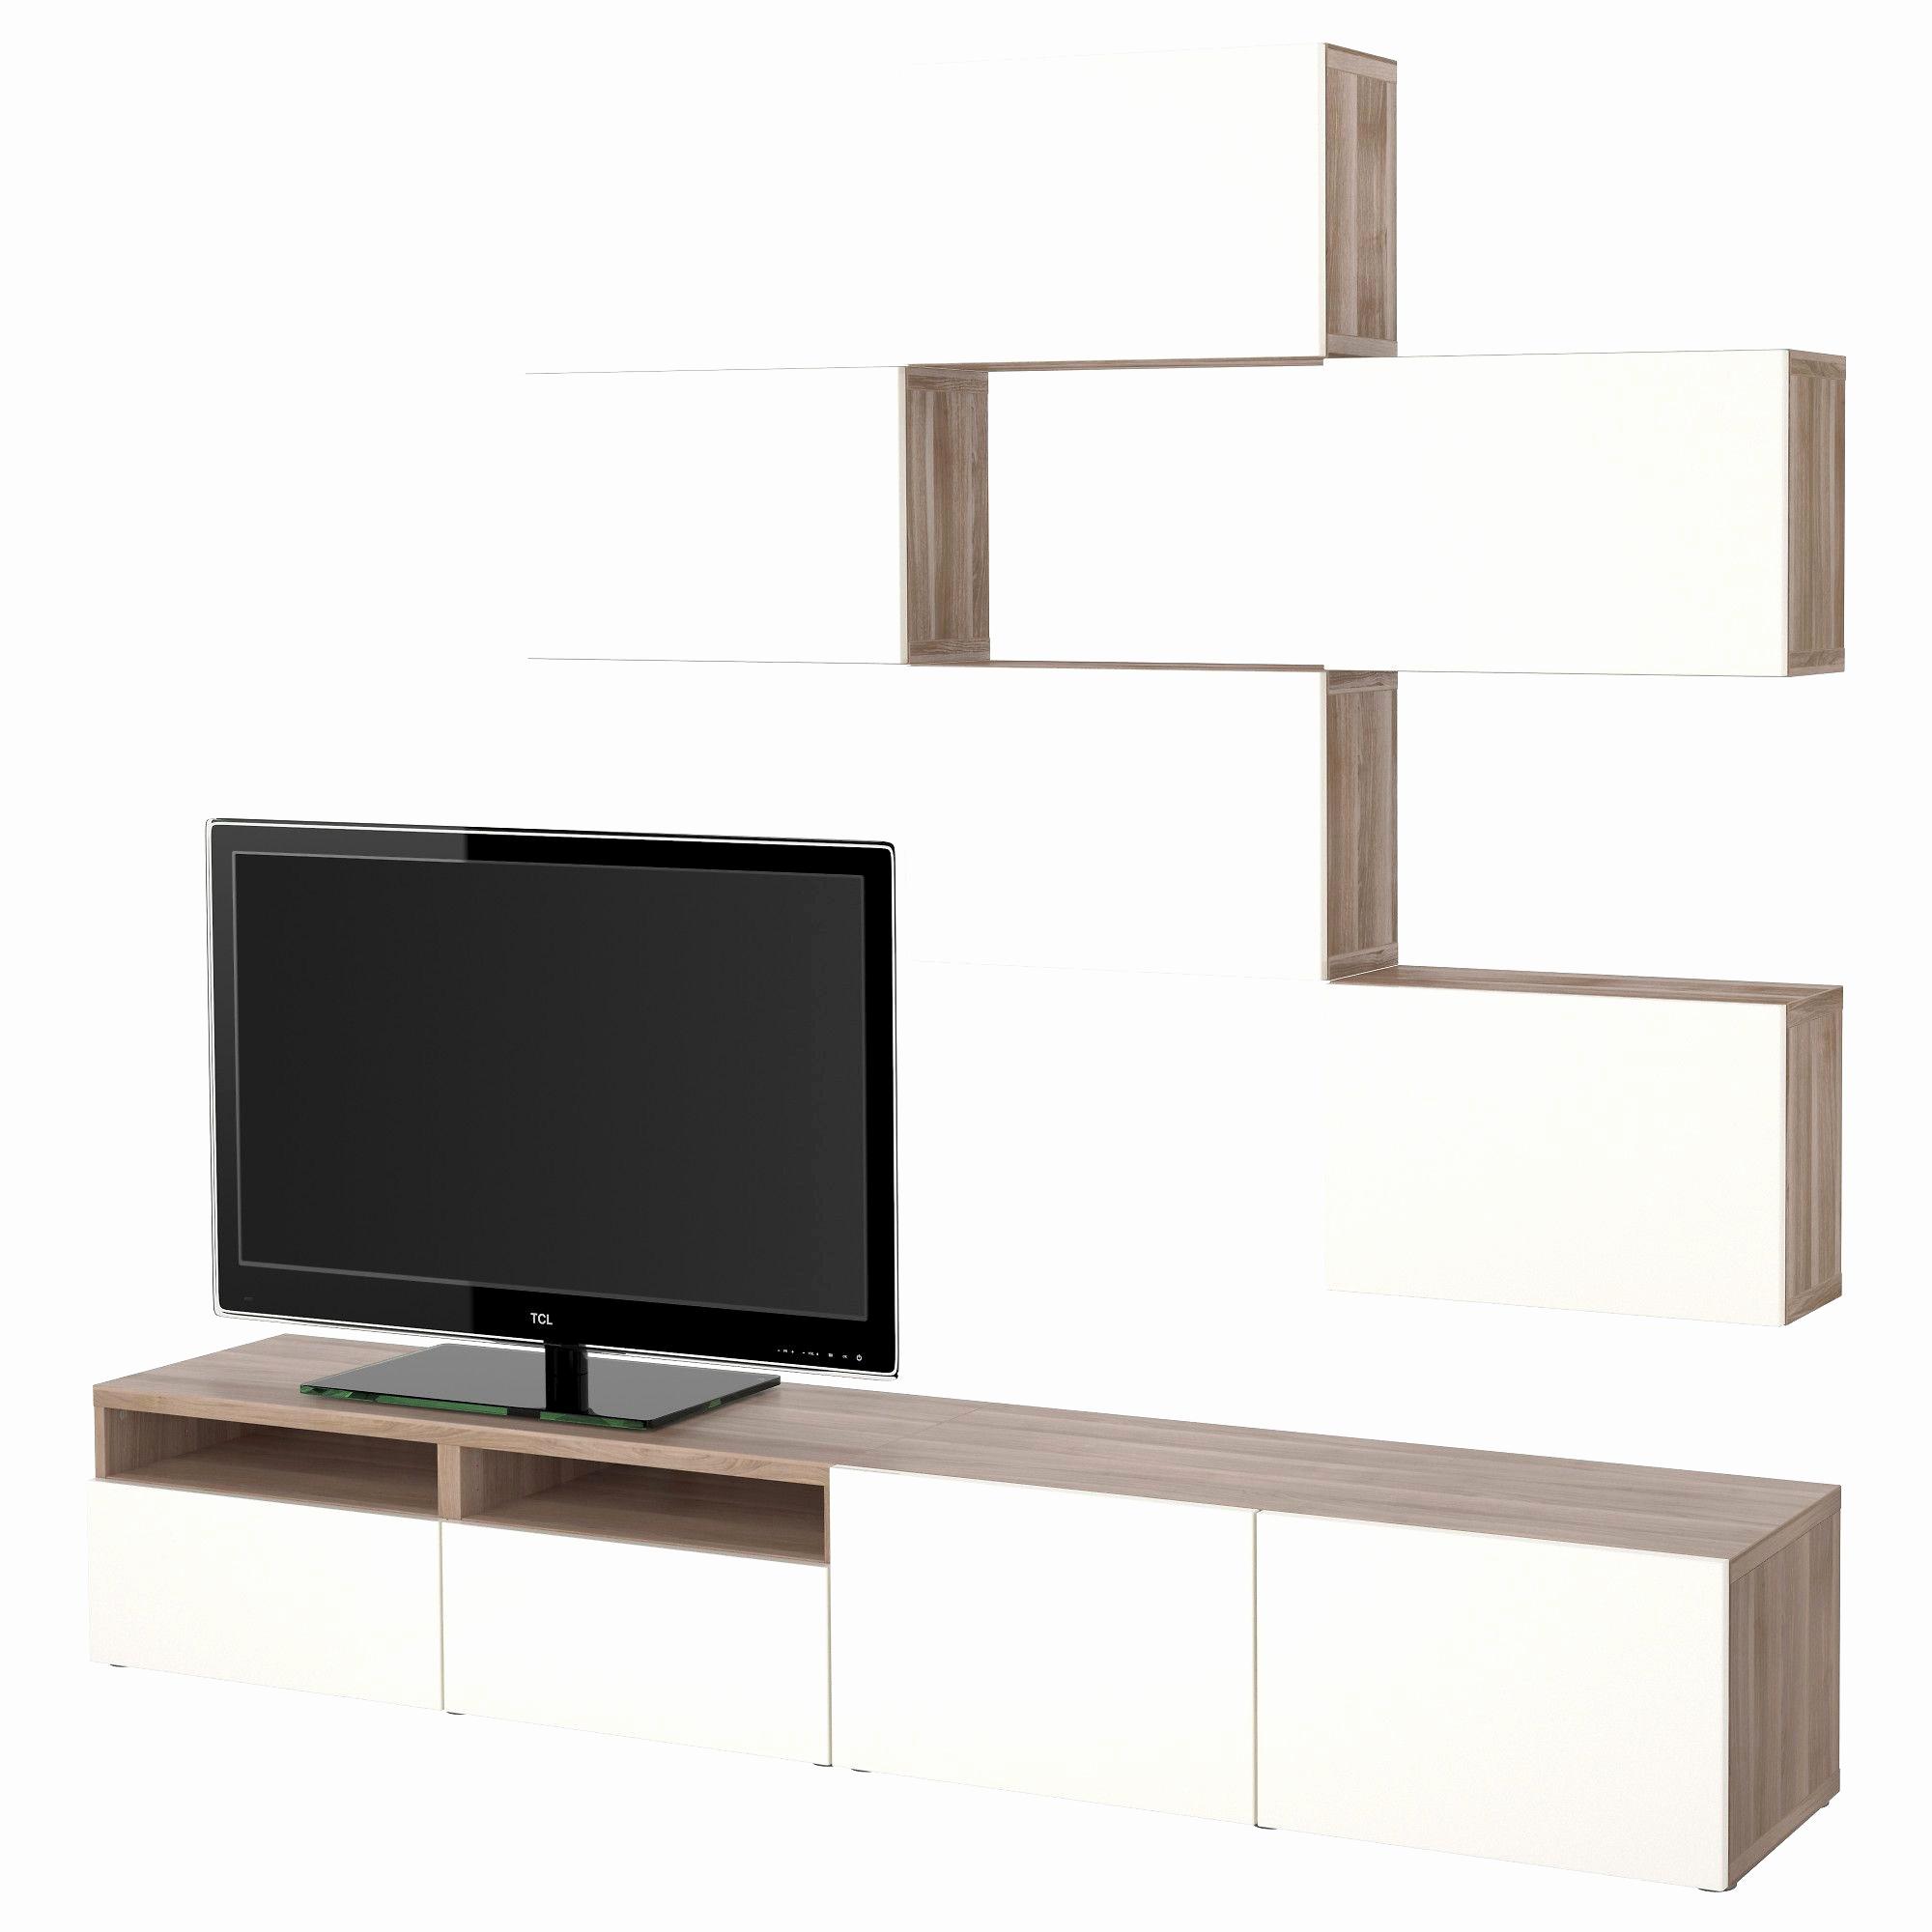 Tv Escamotable Dans Meuble meuble de tv pivotant -